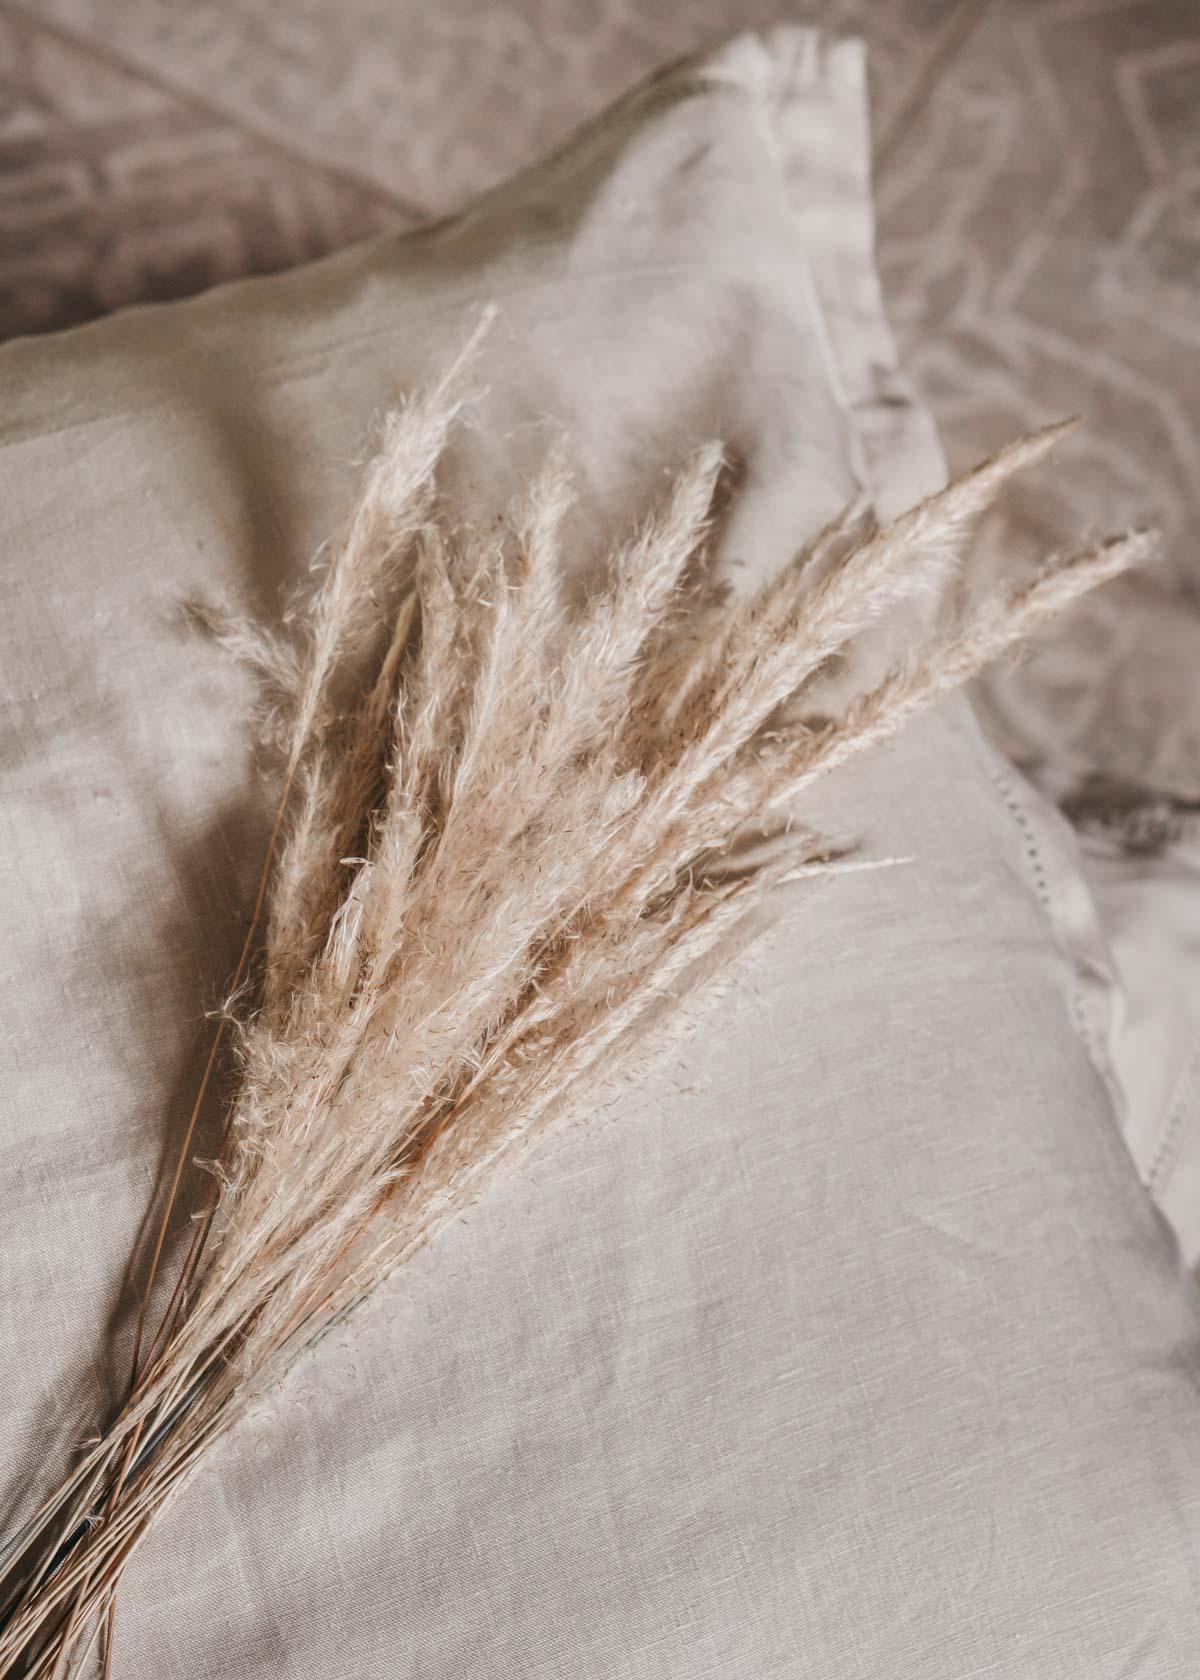 Keira-Mason-in-between-the-sheets-pampas-grass.jpg